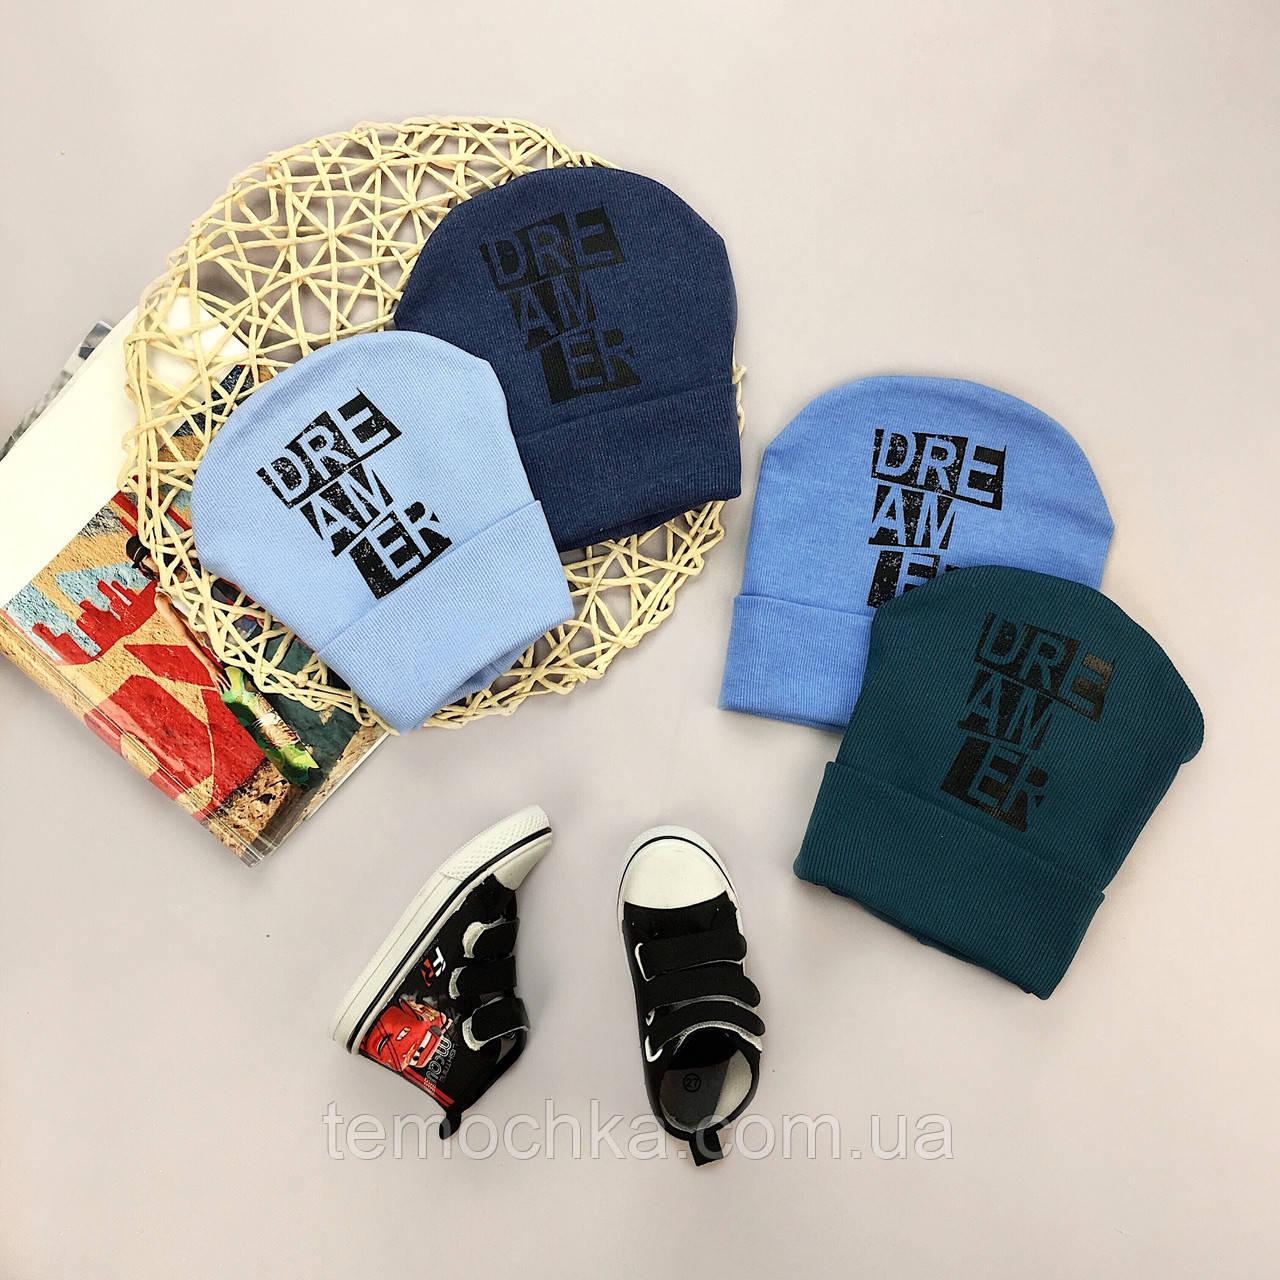 Шапка шапочка для мальчика